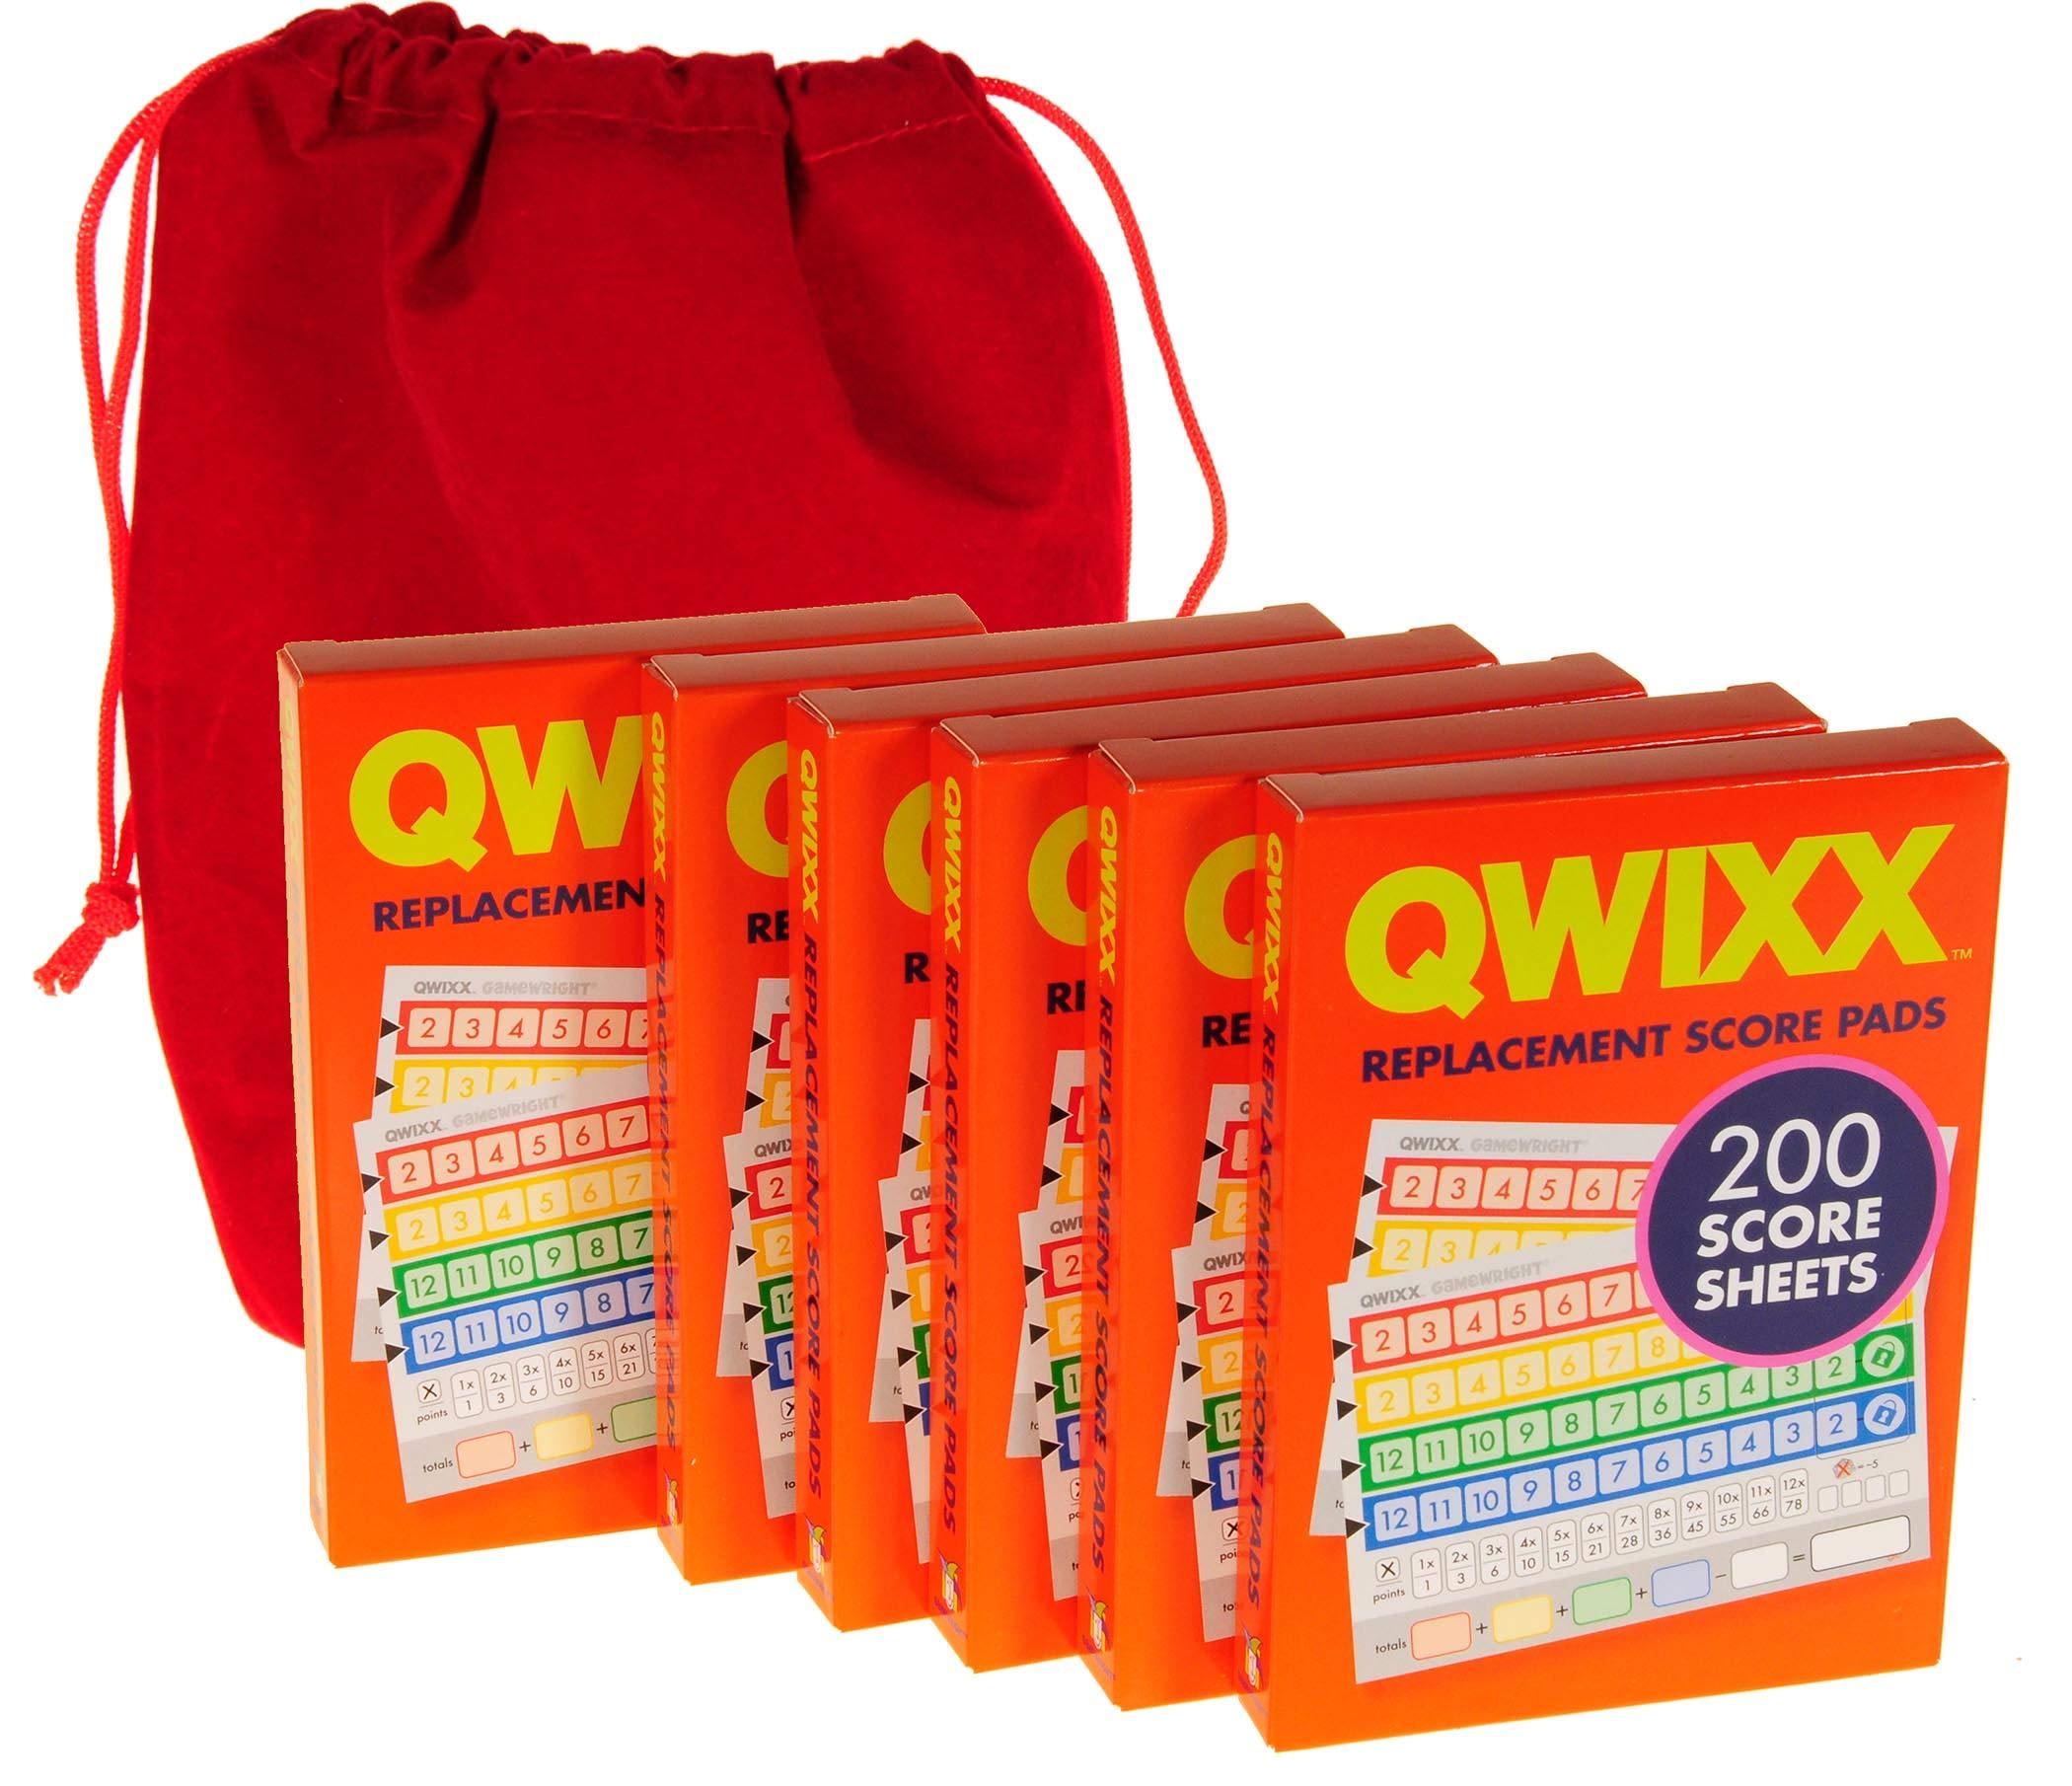 QWIXX 6 Replacement Score Pad Packs - 1,200 Score Sheets || Bonus Red Velvet Drawstring Pouch || Bundled Items